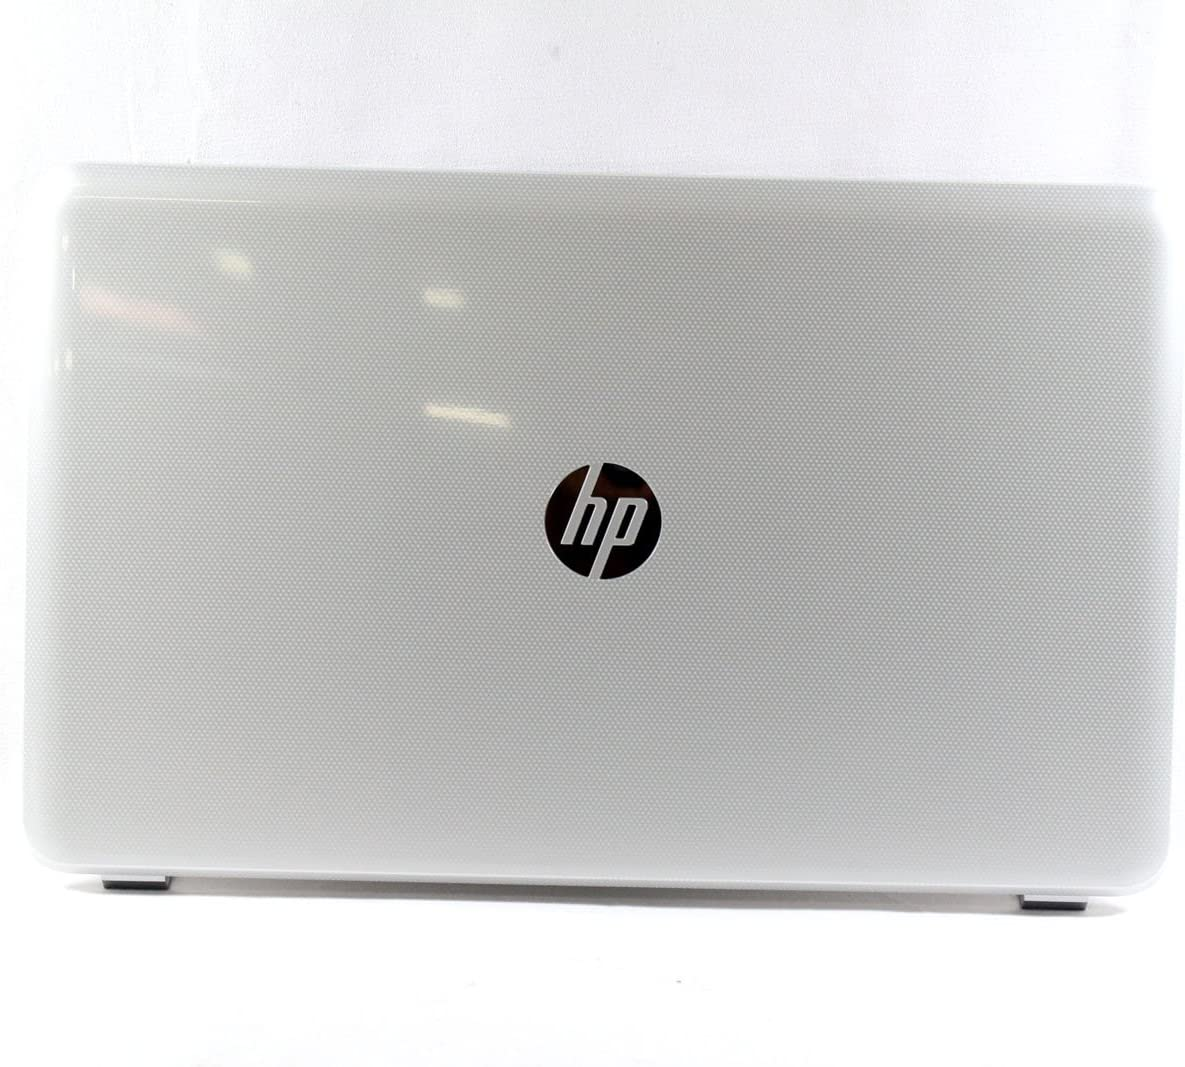 "HP New Genuine Pavilion 17-e 17-E118DX 17.3"" LCD Back Cover EAR680010B0 725362-001"